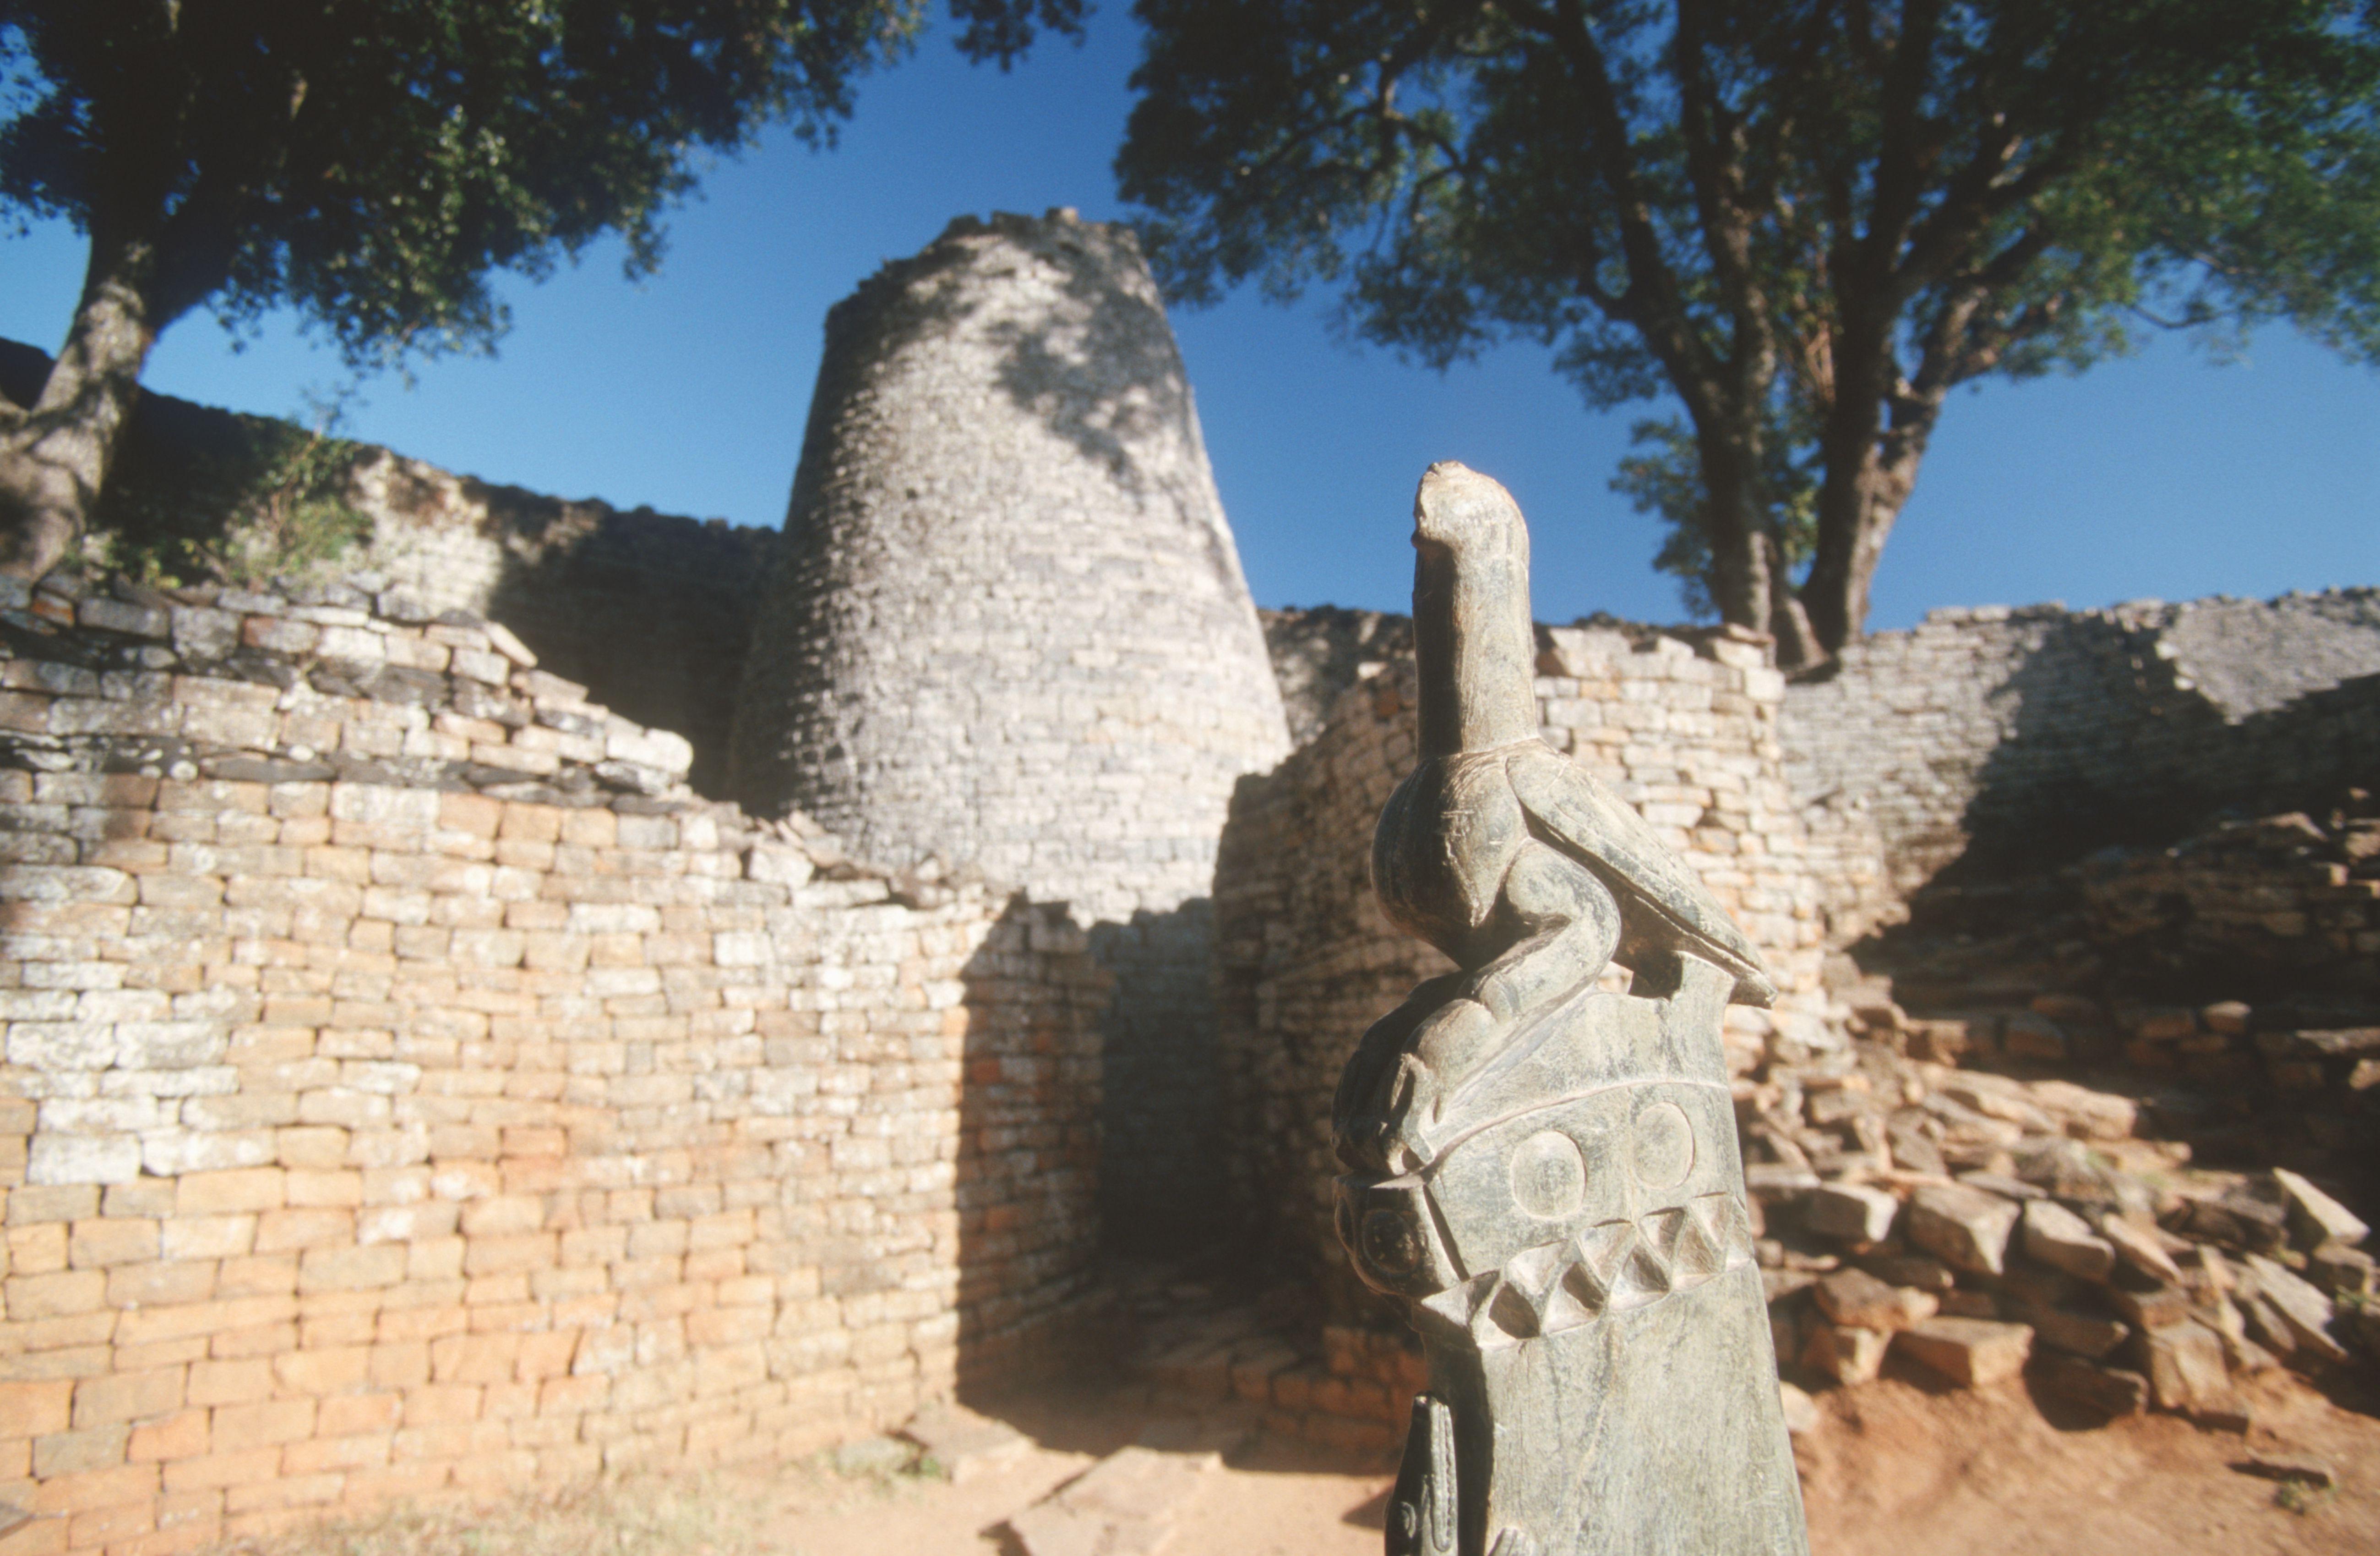 Zimbabwe Bird, Great Zimbabwe ruins, Zimbabwe